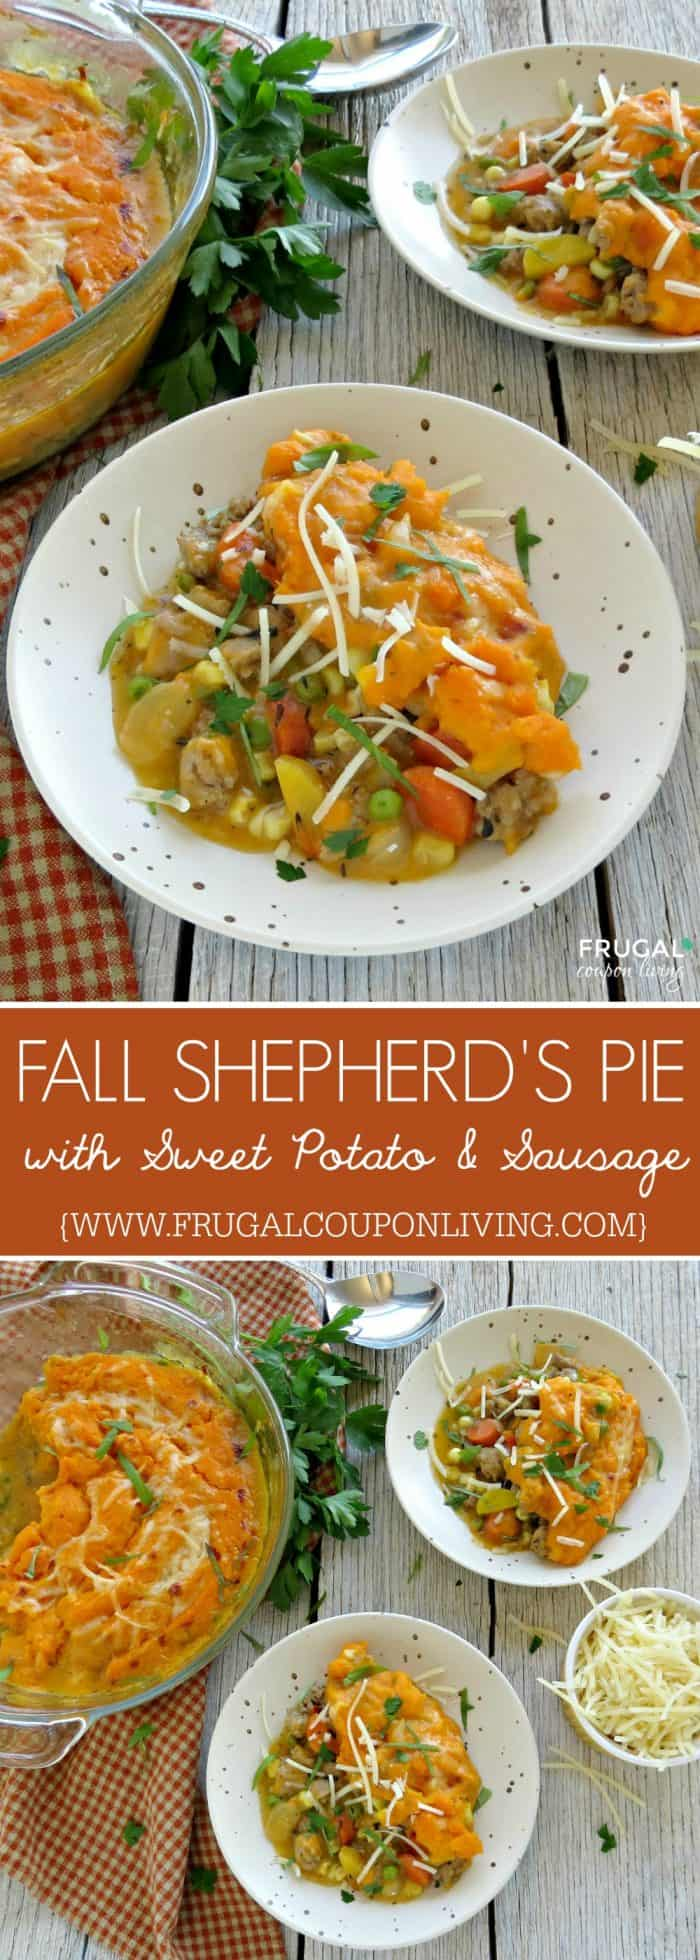 fall-sausage-shepherds-pie-long-frugal-coupon-living